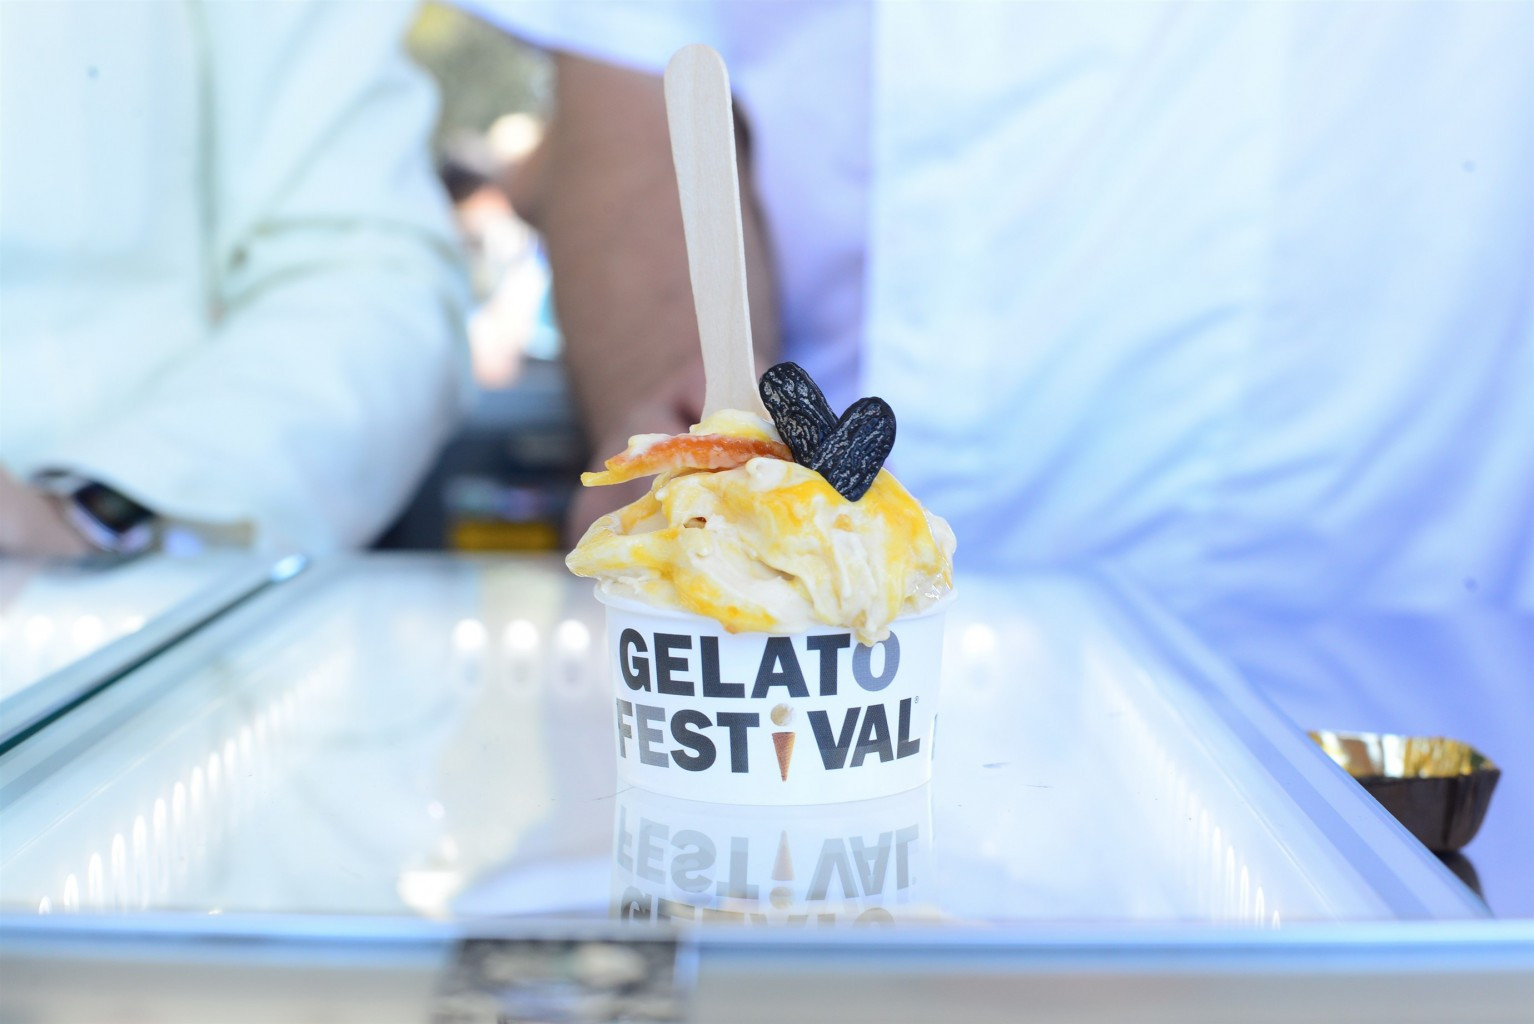 gelato festival gelato